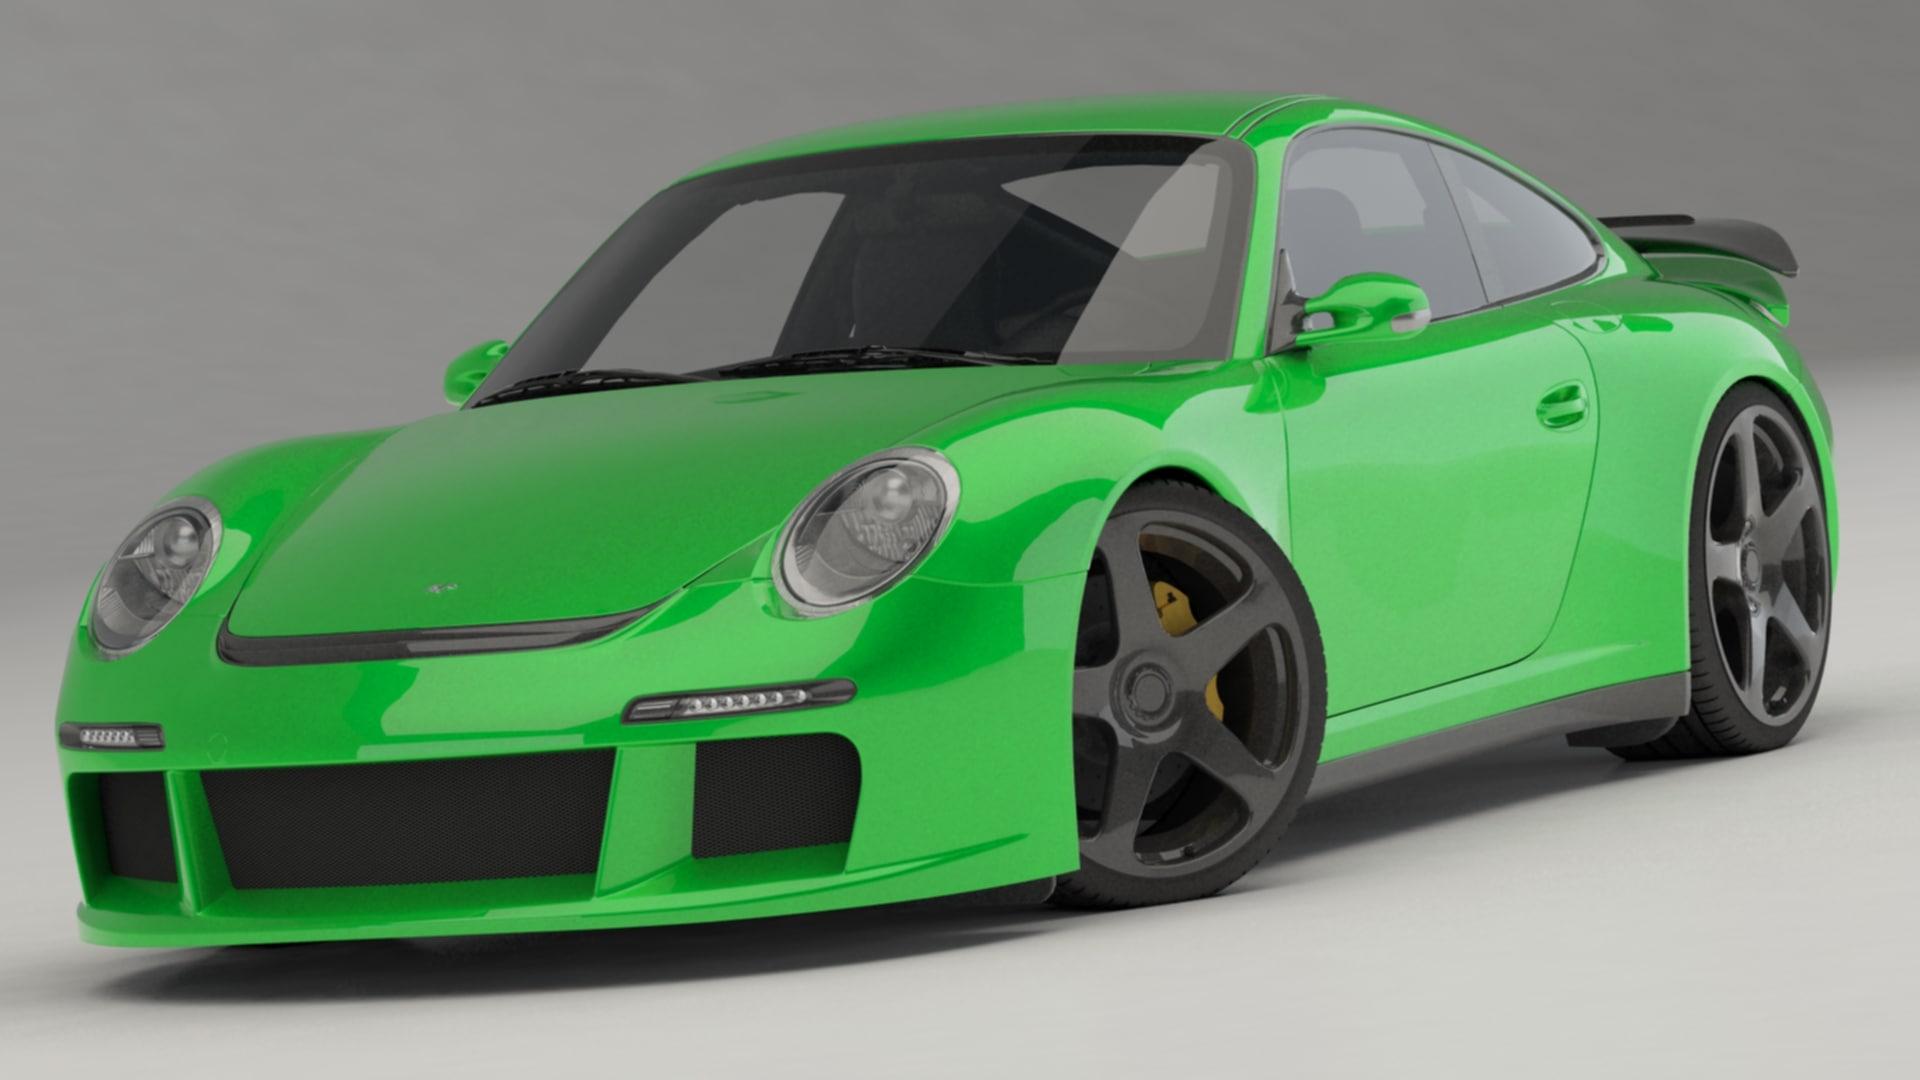 ruf rgt-8 2011 3D model